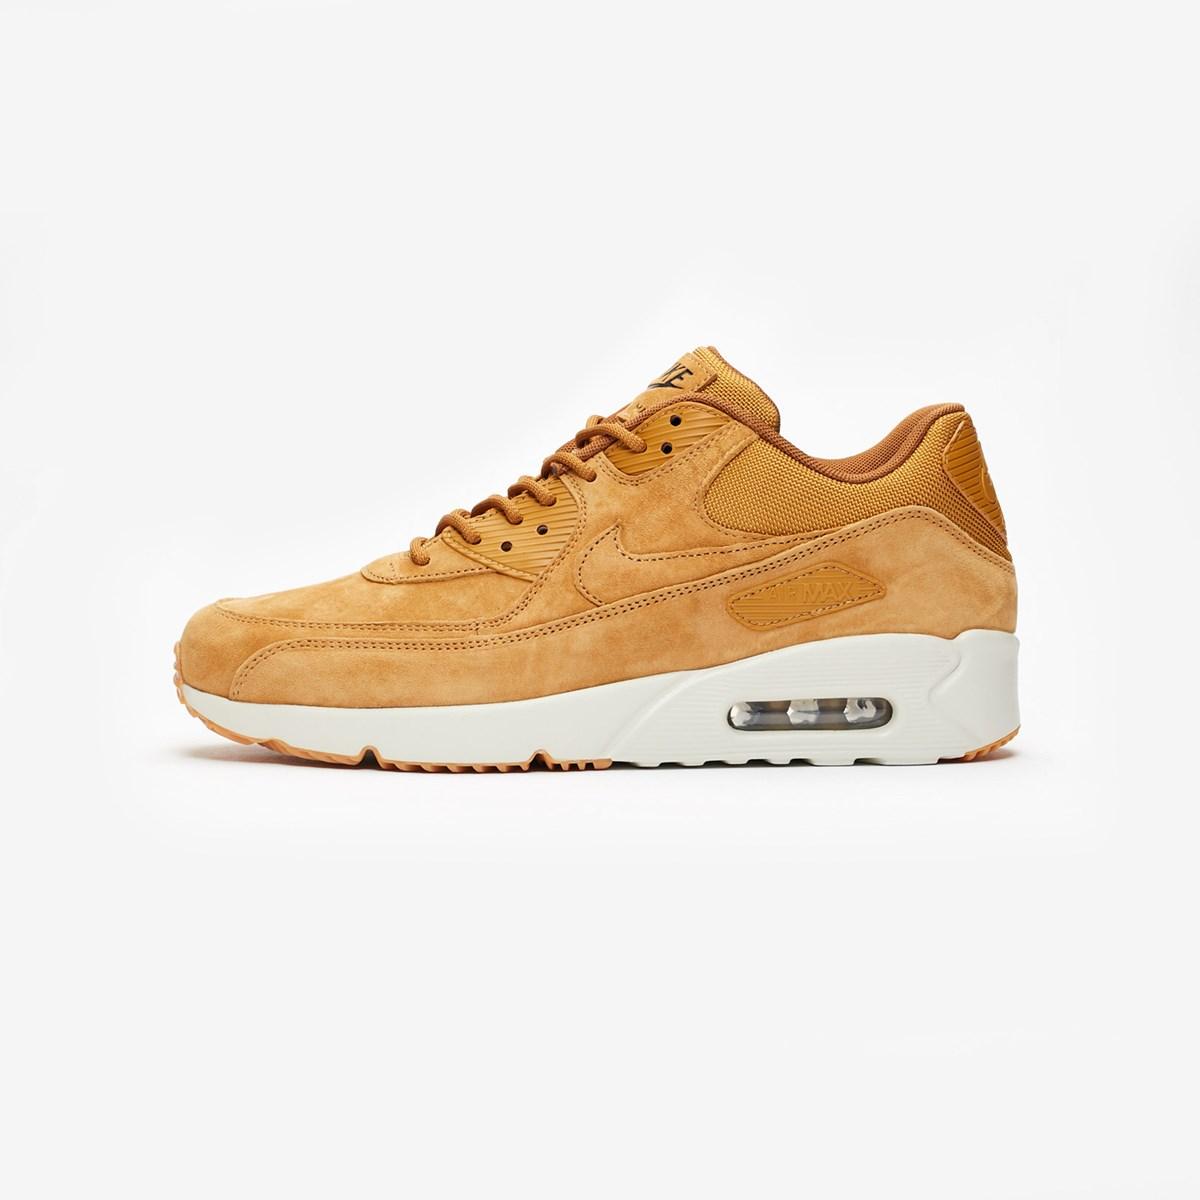 Nike Air Max 90 Ultra 2.0 LTR - 924447-700 - SNS | sneakers & streetwear online since 1999